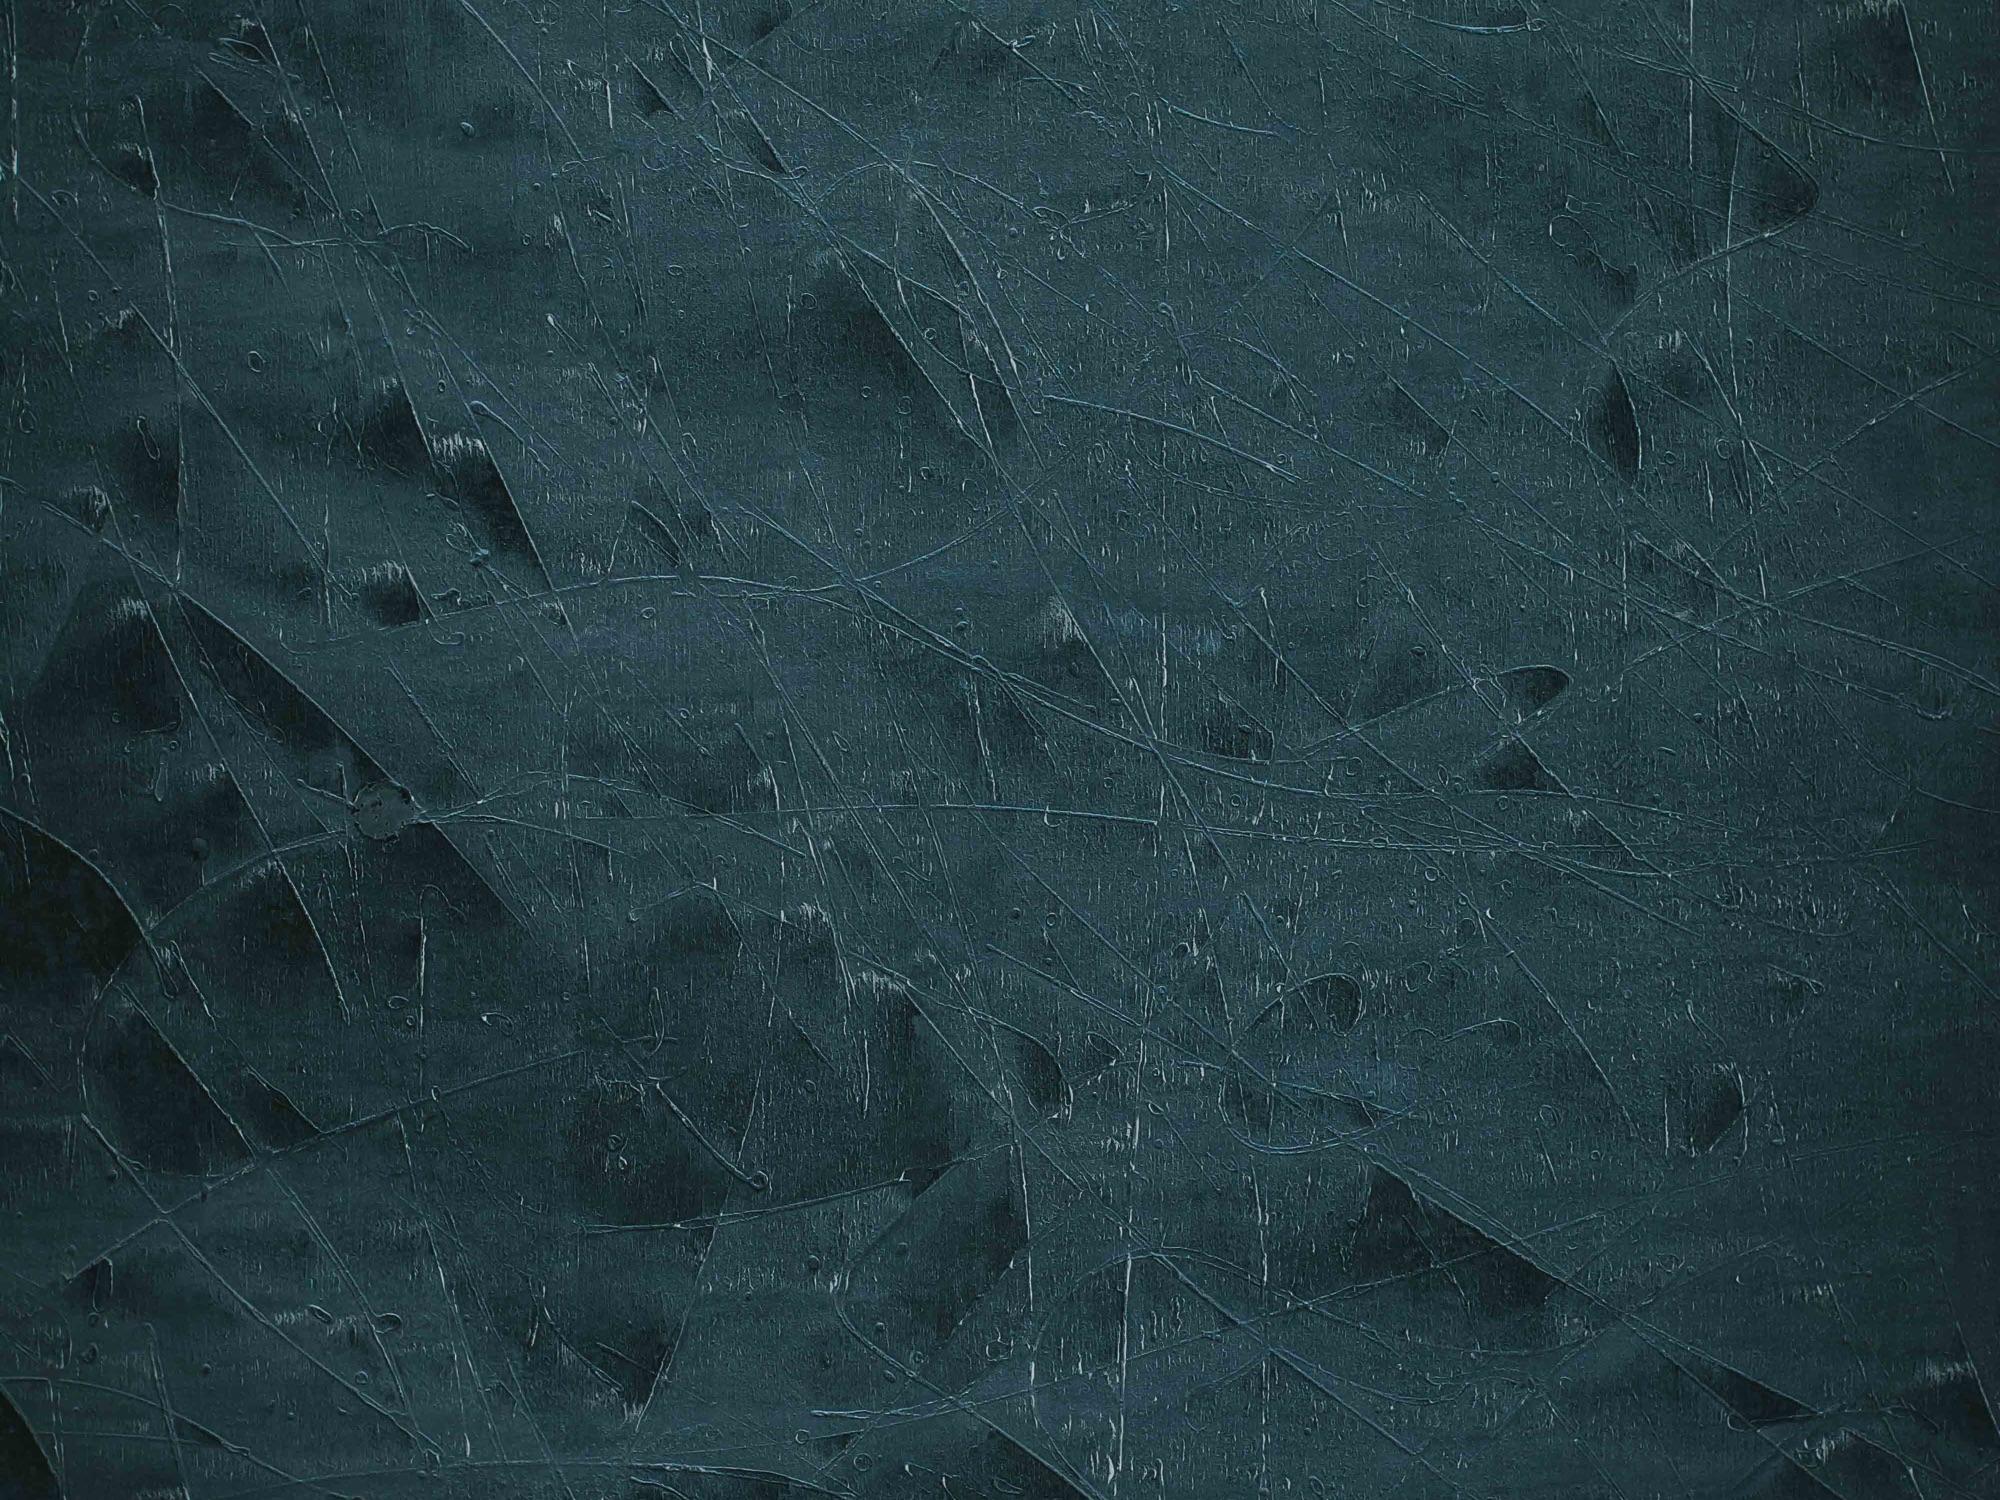 Generic texture pattern image.